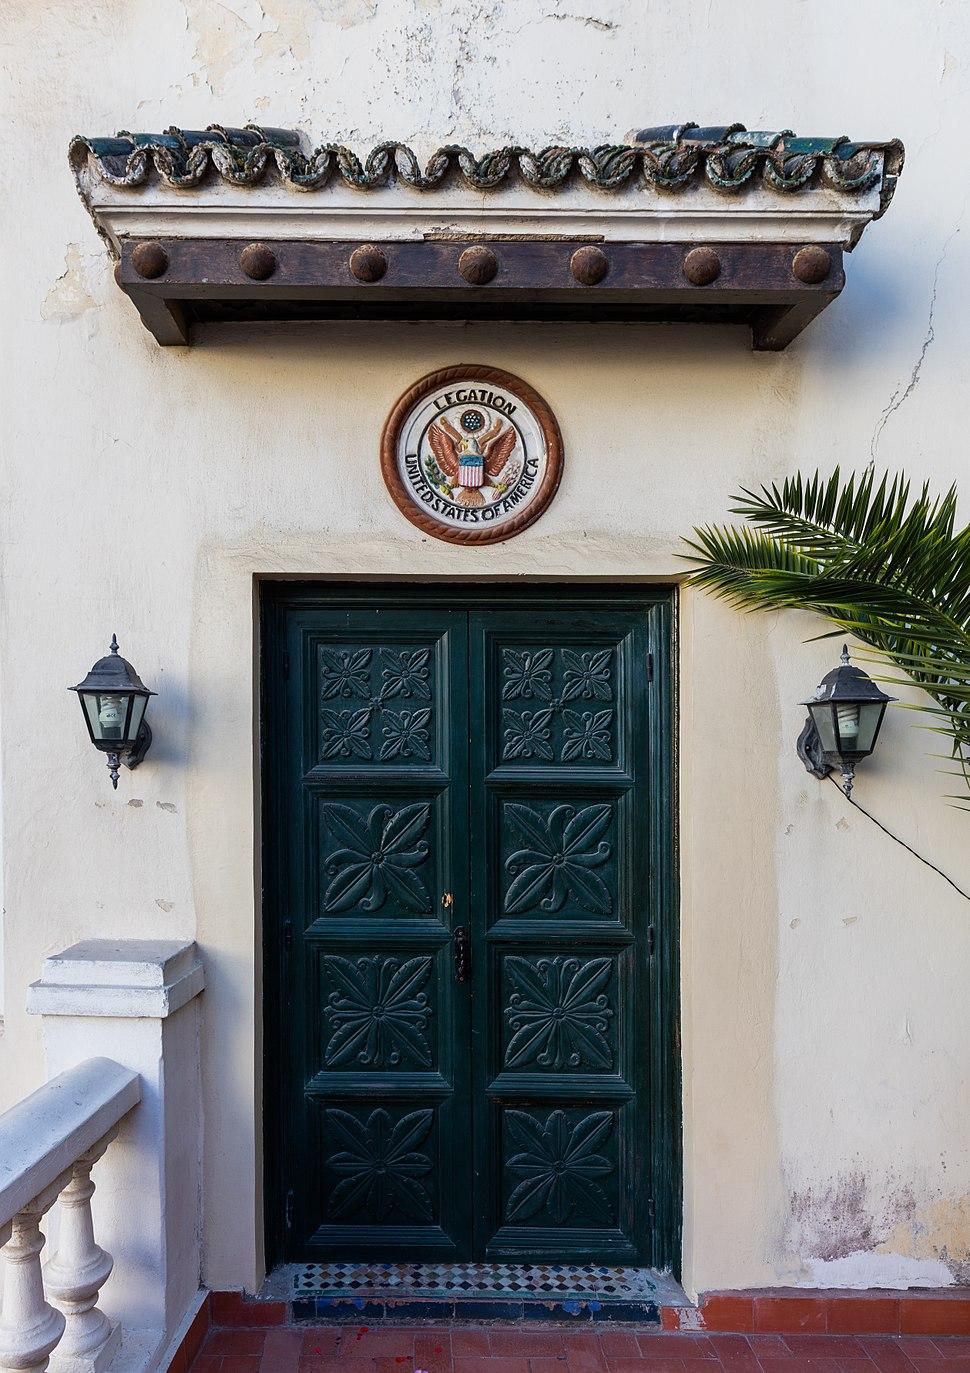 Museo del Antiguo Legado Estadounidense, Tánger, Marruecos, 2015-12-11, DD 41